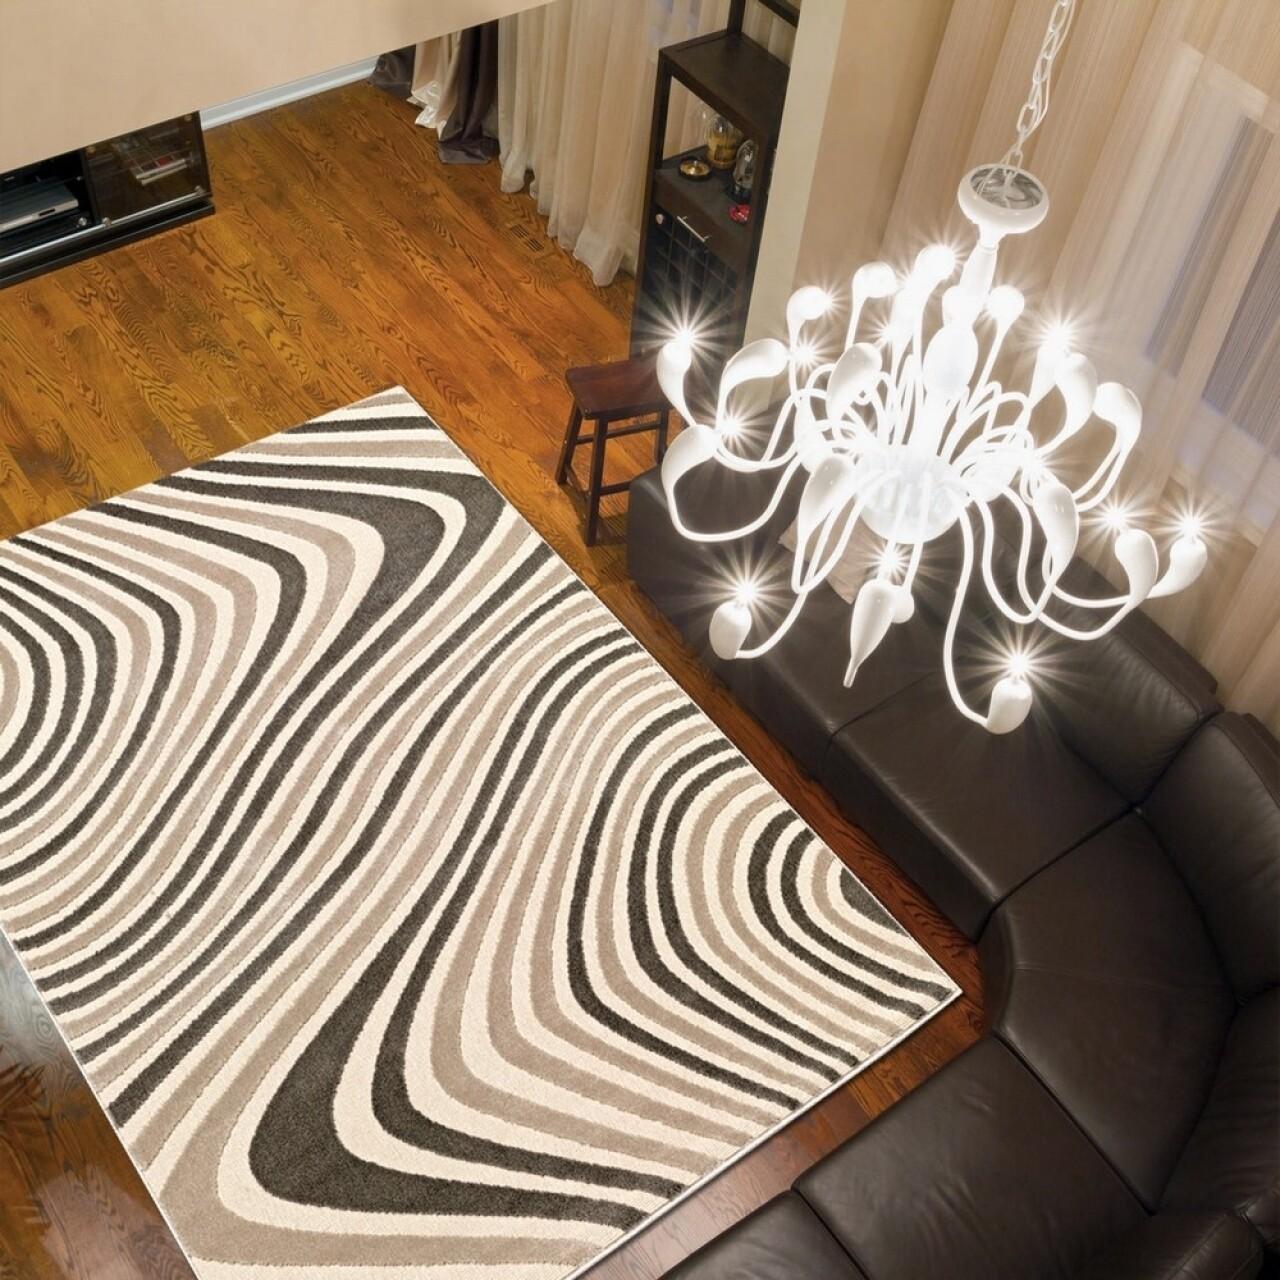 Covor Reflex, Floorita, 160 x 230 cm, 100% polipropilena, bej/maro